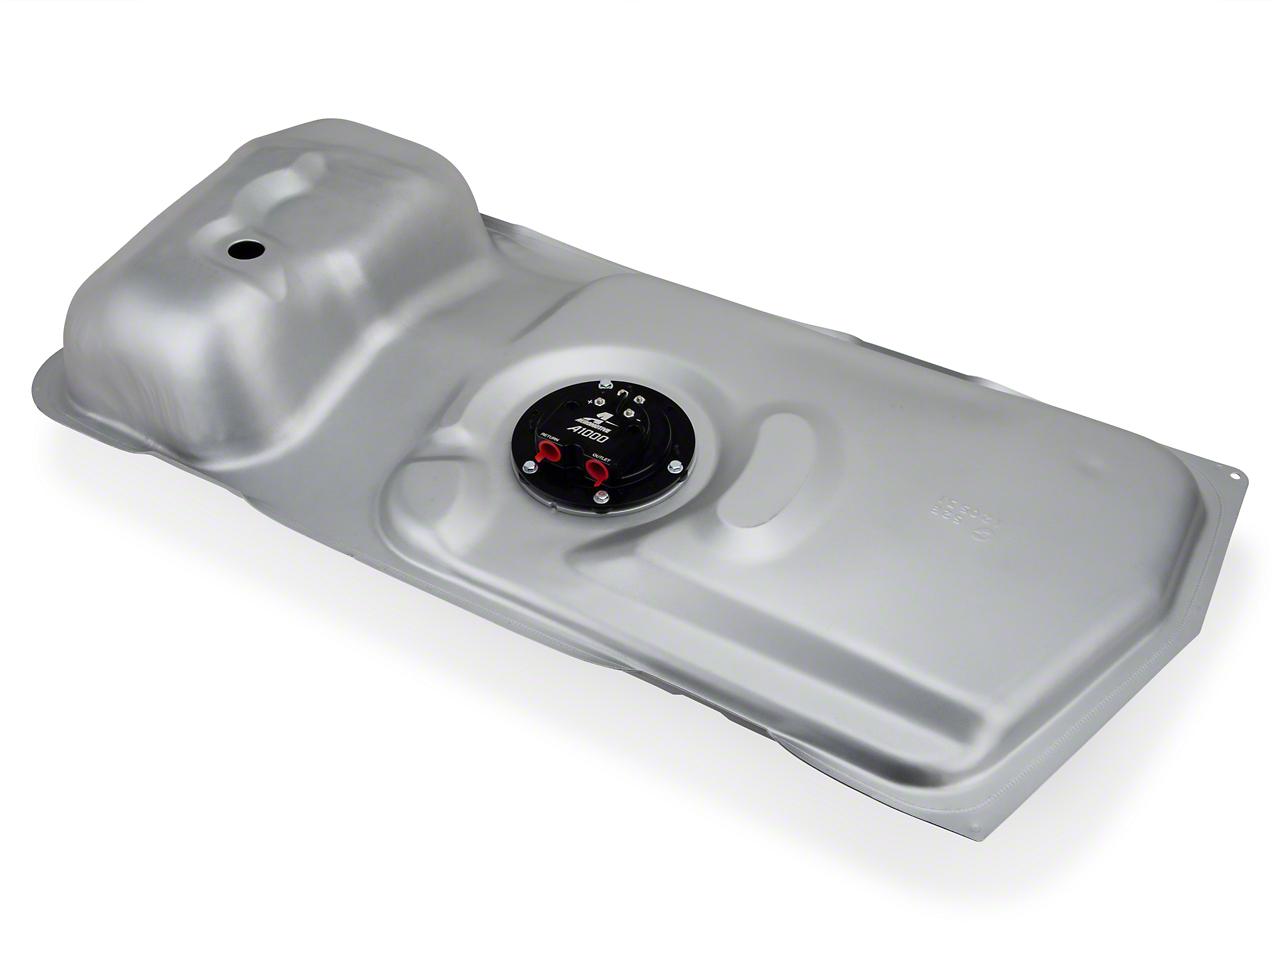 Aeromotive Stealth Fuel Kit w/ Tank- A1000 (86-Mid 98 V8)